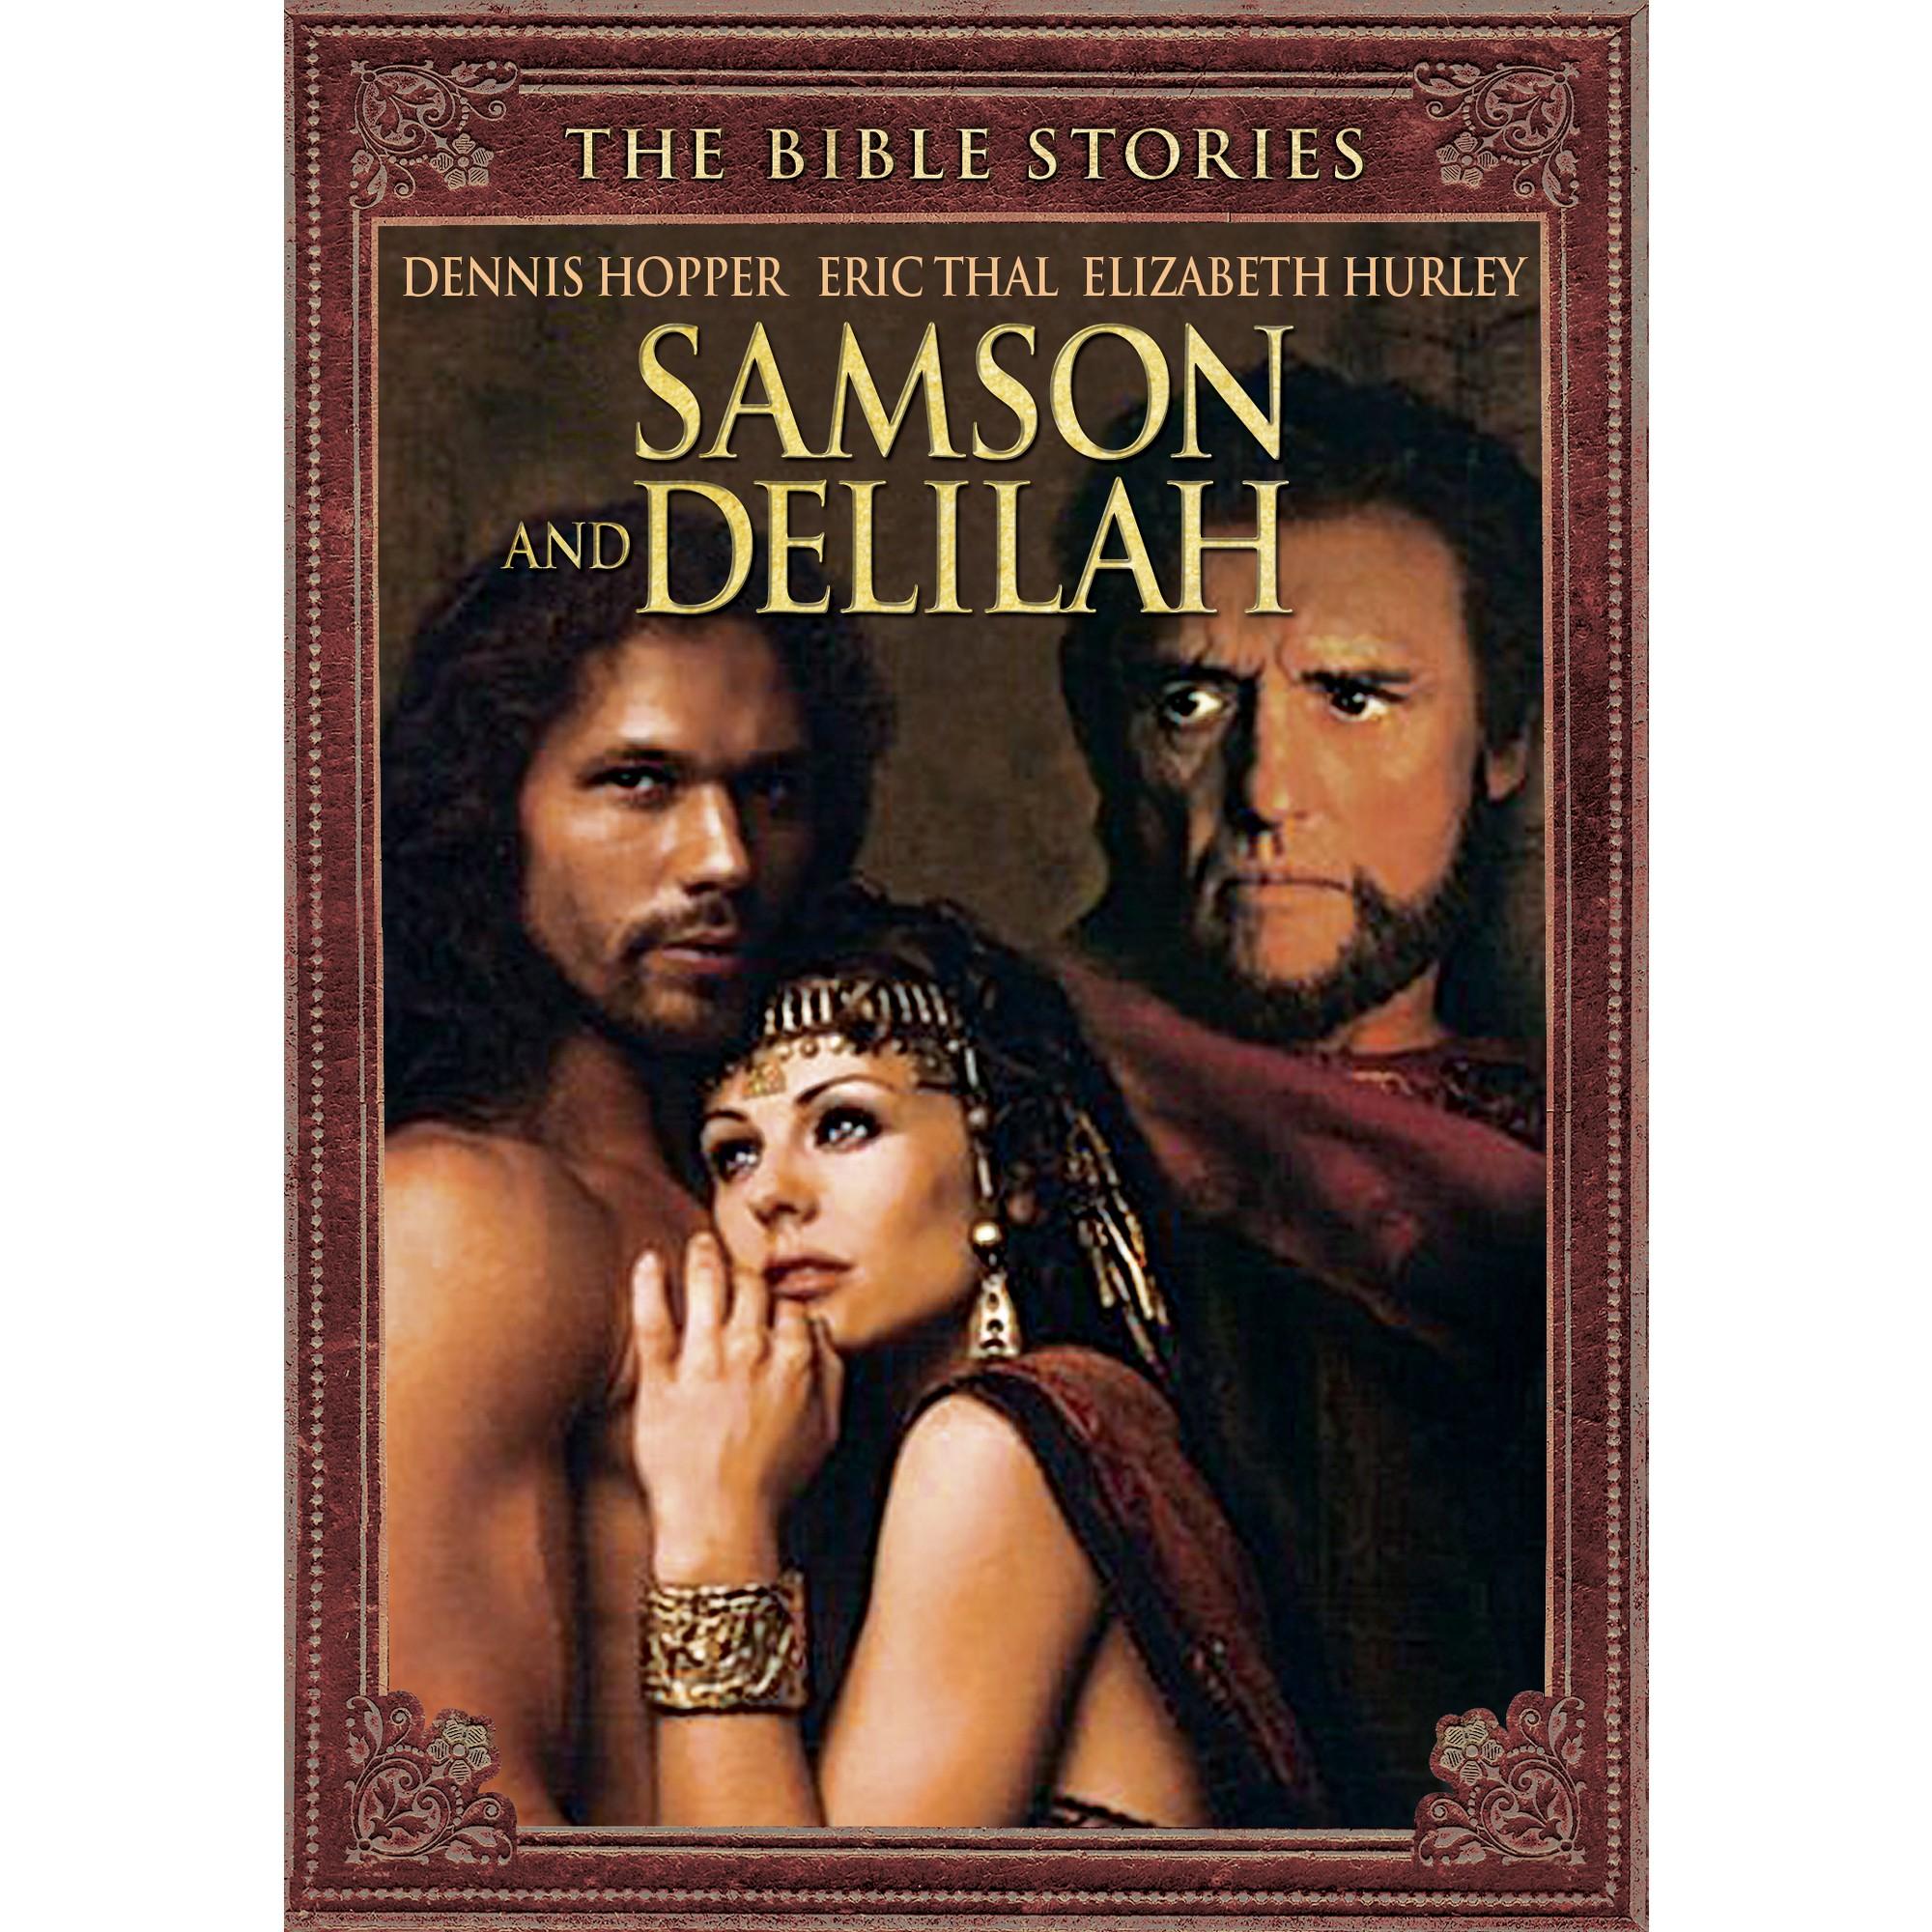 Bible Stories Samson And Delilah Dvd